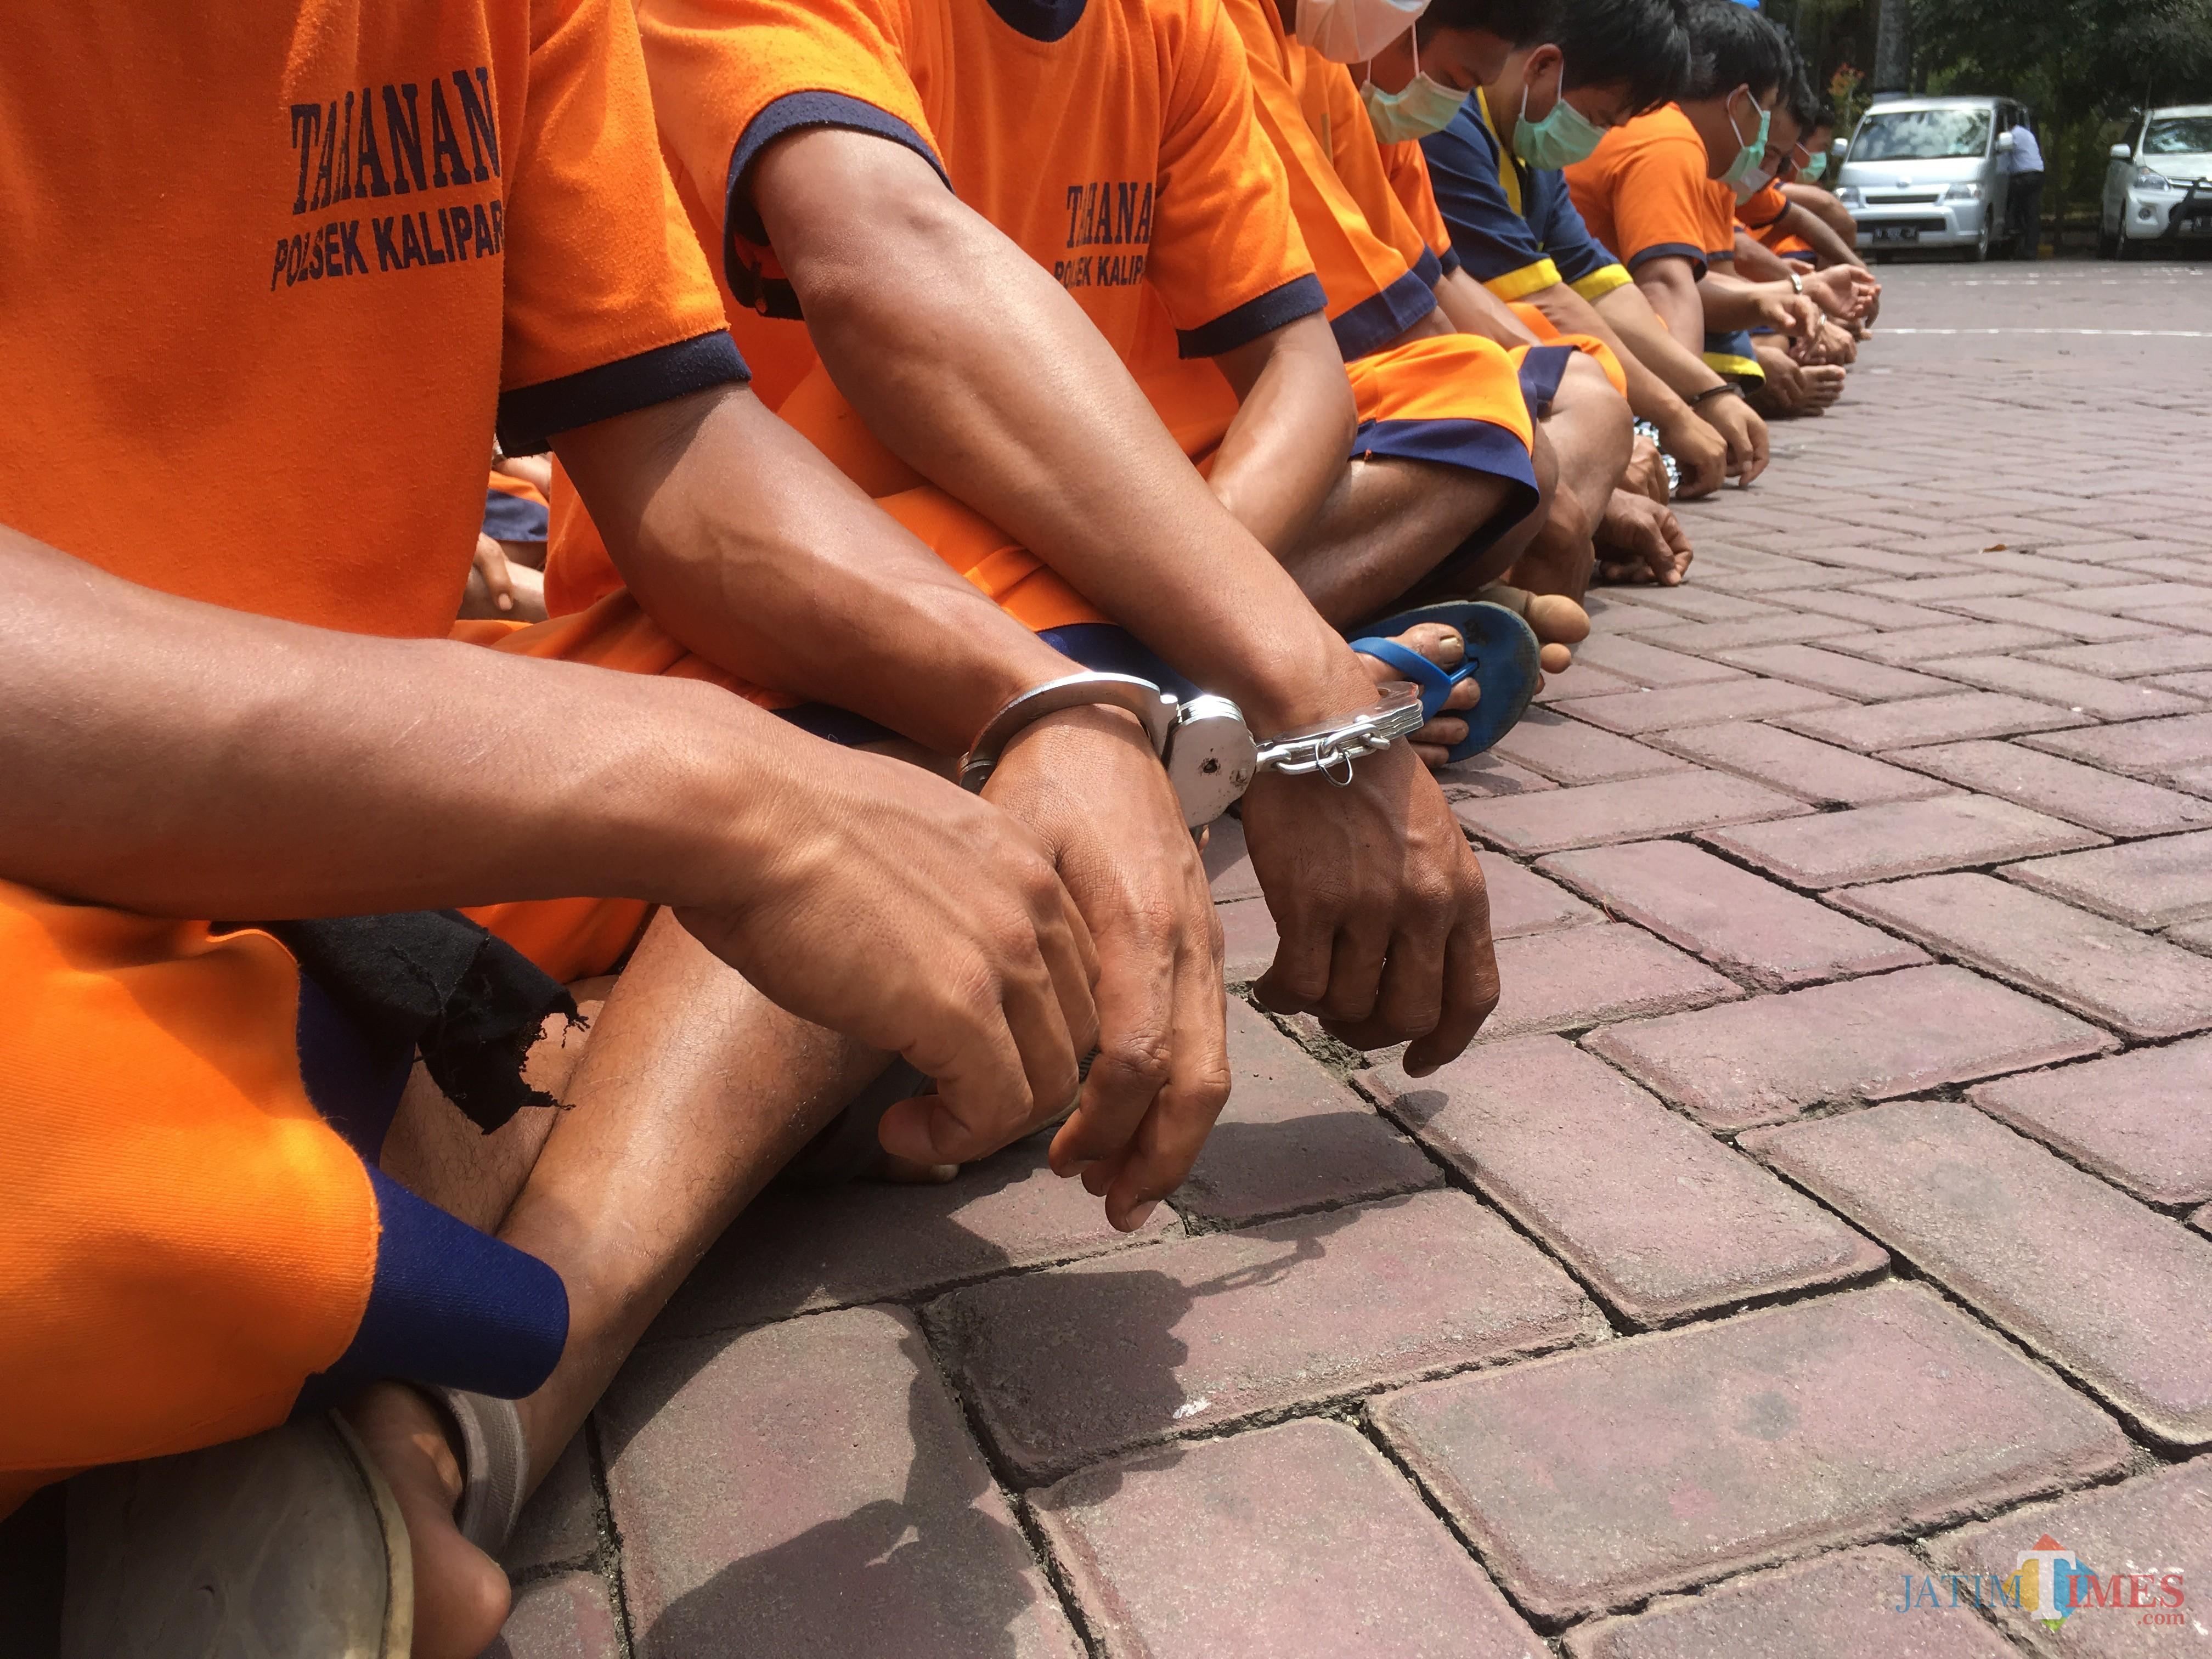 Ilustrasi tersangka yang terlibat aksi kriminal saat diamankan Polres Malang, Kabupaten Malang (Foto : Ashaq Lupito / MalangTIMES)